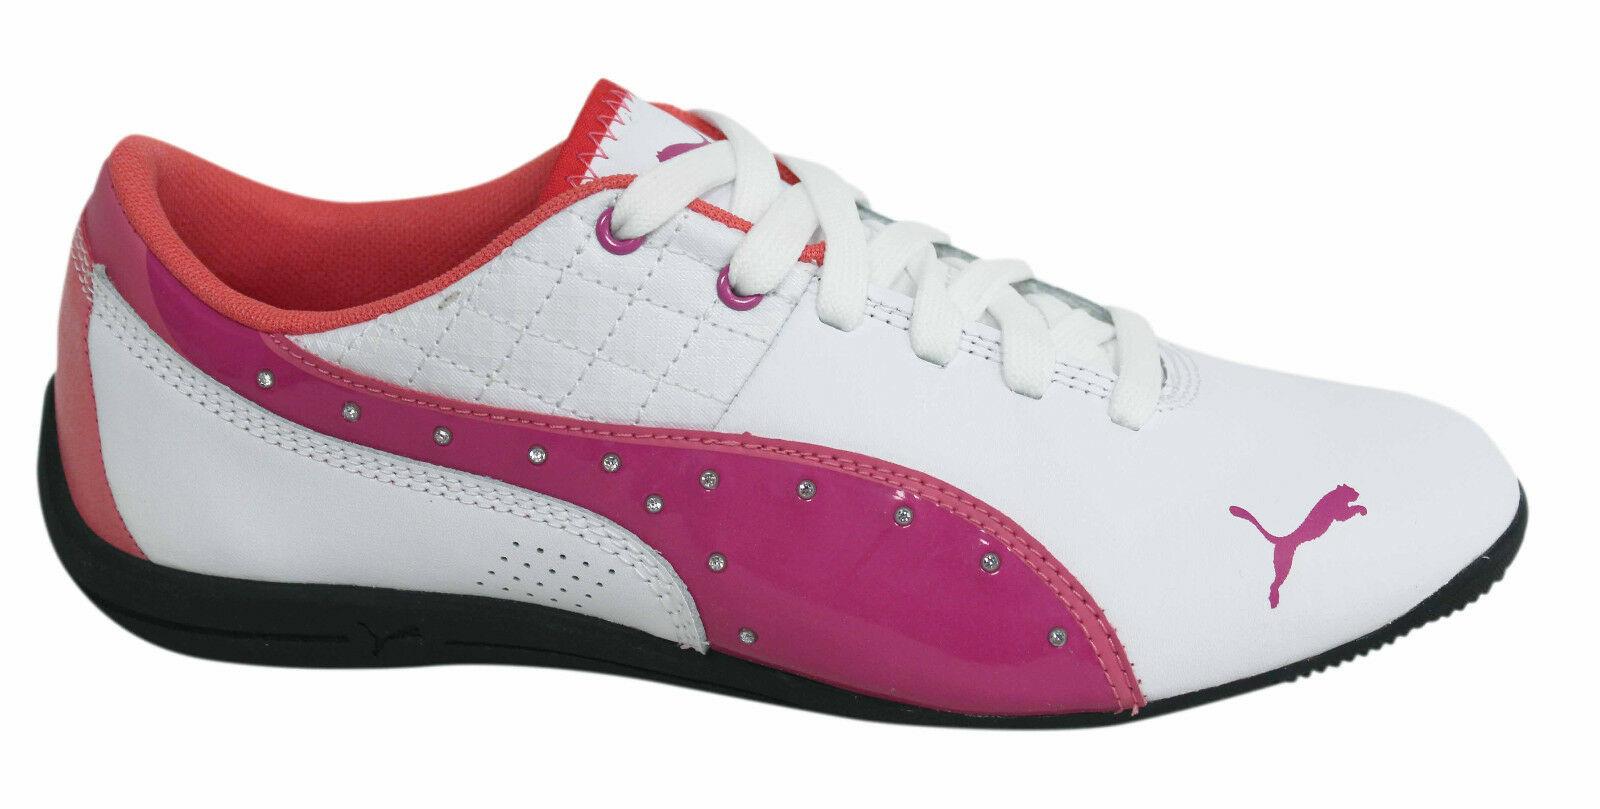 Ortodoxo Papúa Nueva Guinea fe  Puma Drift Cat 6 Junior Kids Lace Up White Pink Trainers 305185 01 D94 |  eBay